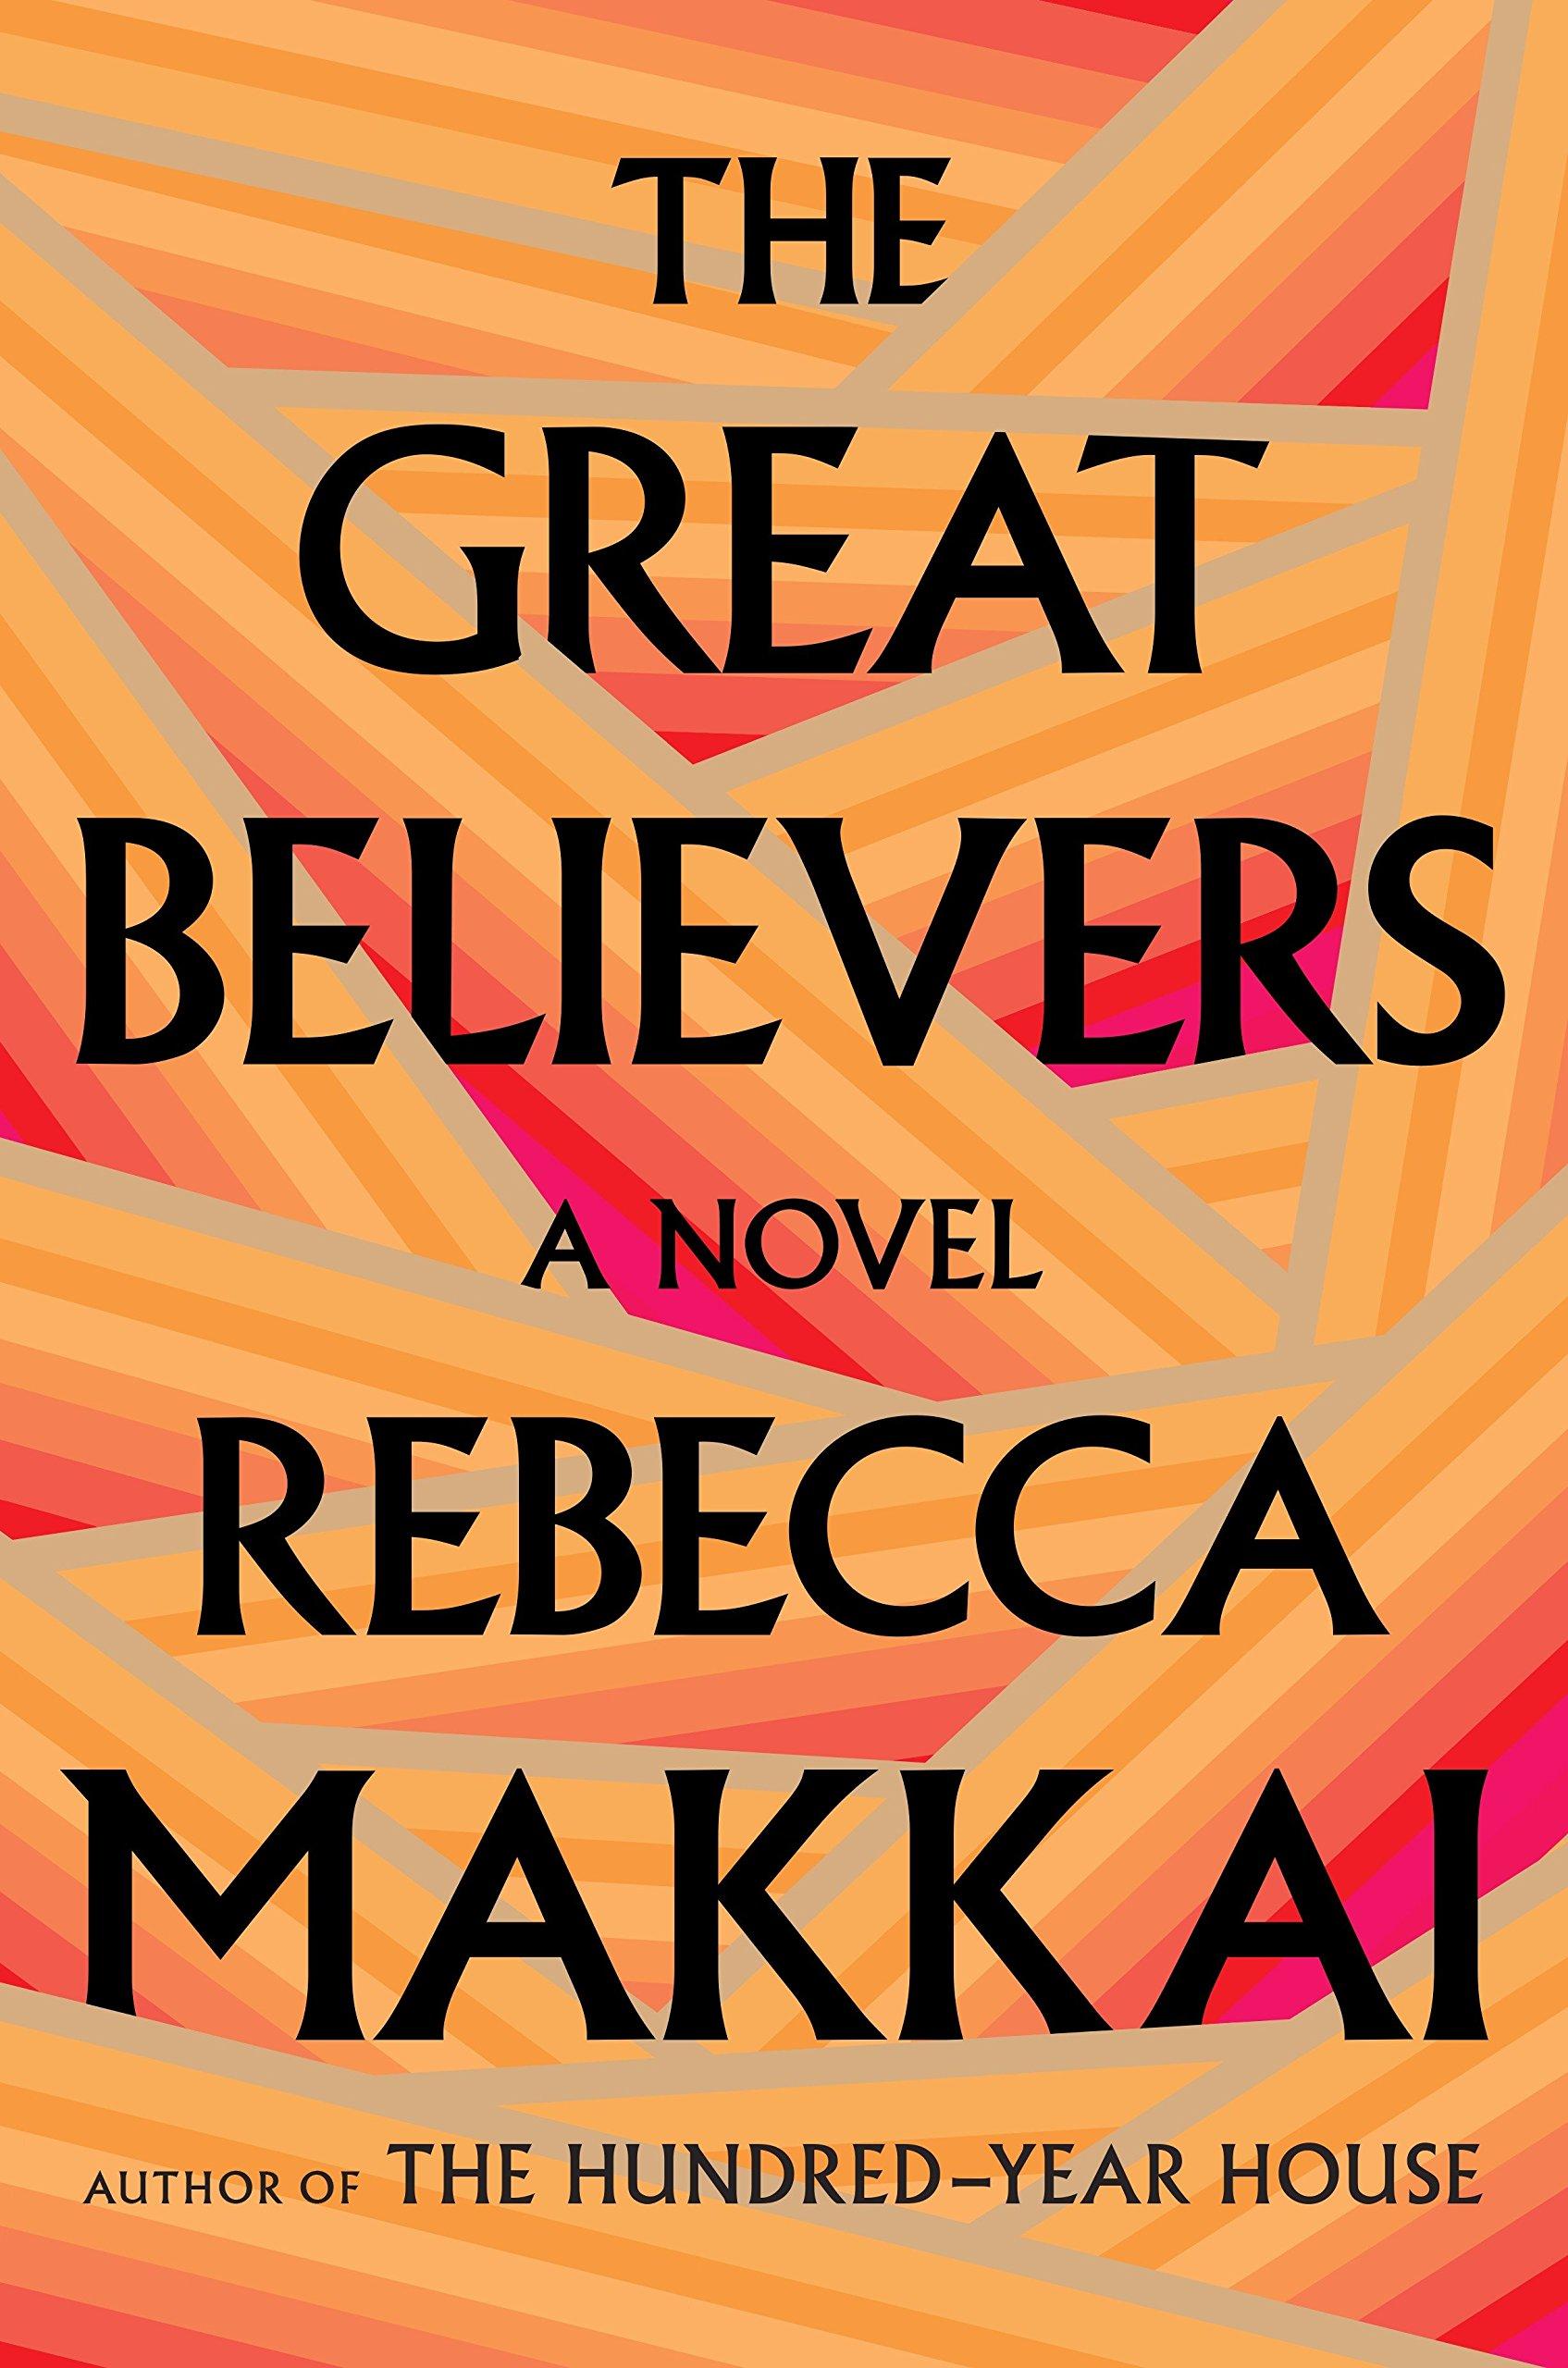 Rebecca Makkai: THE GREAT BELIEVERS